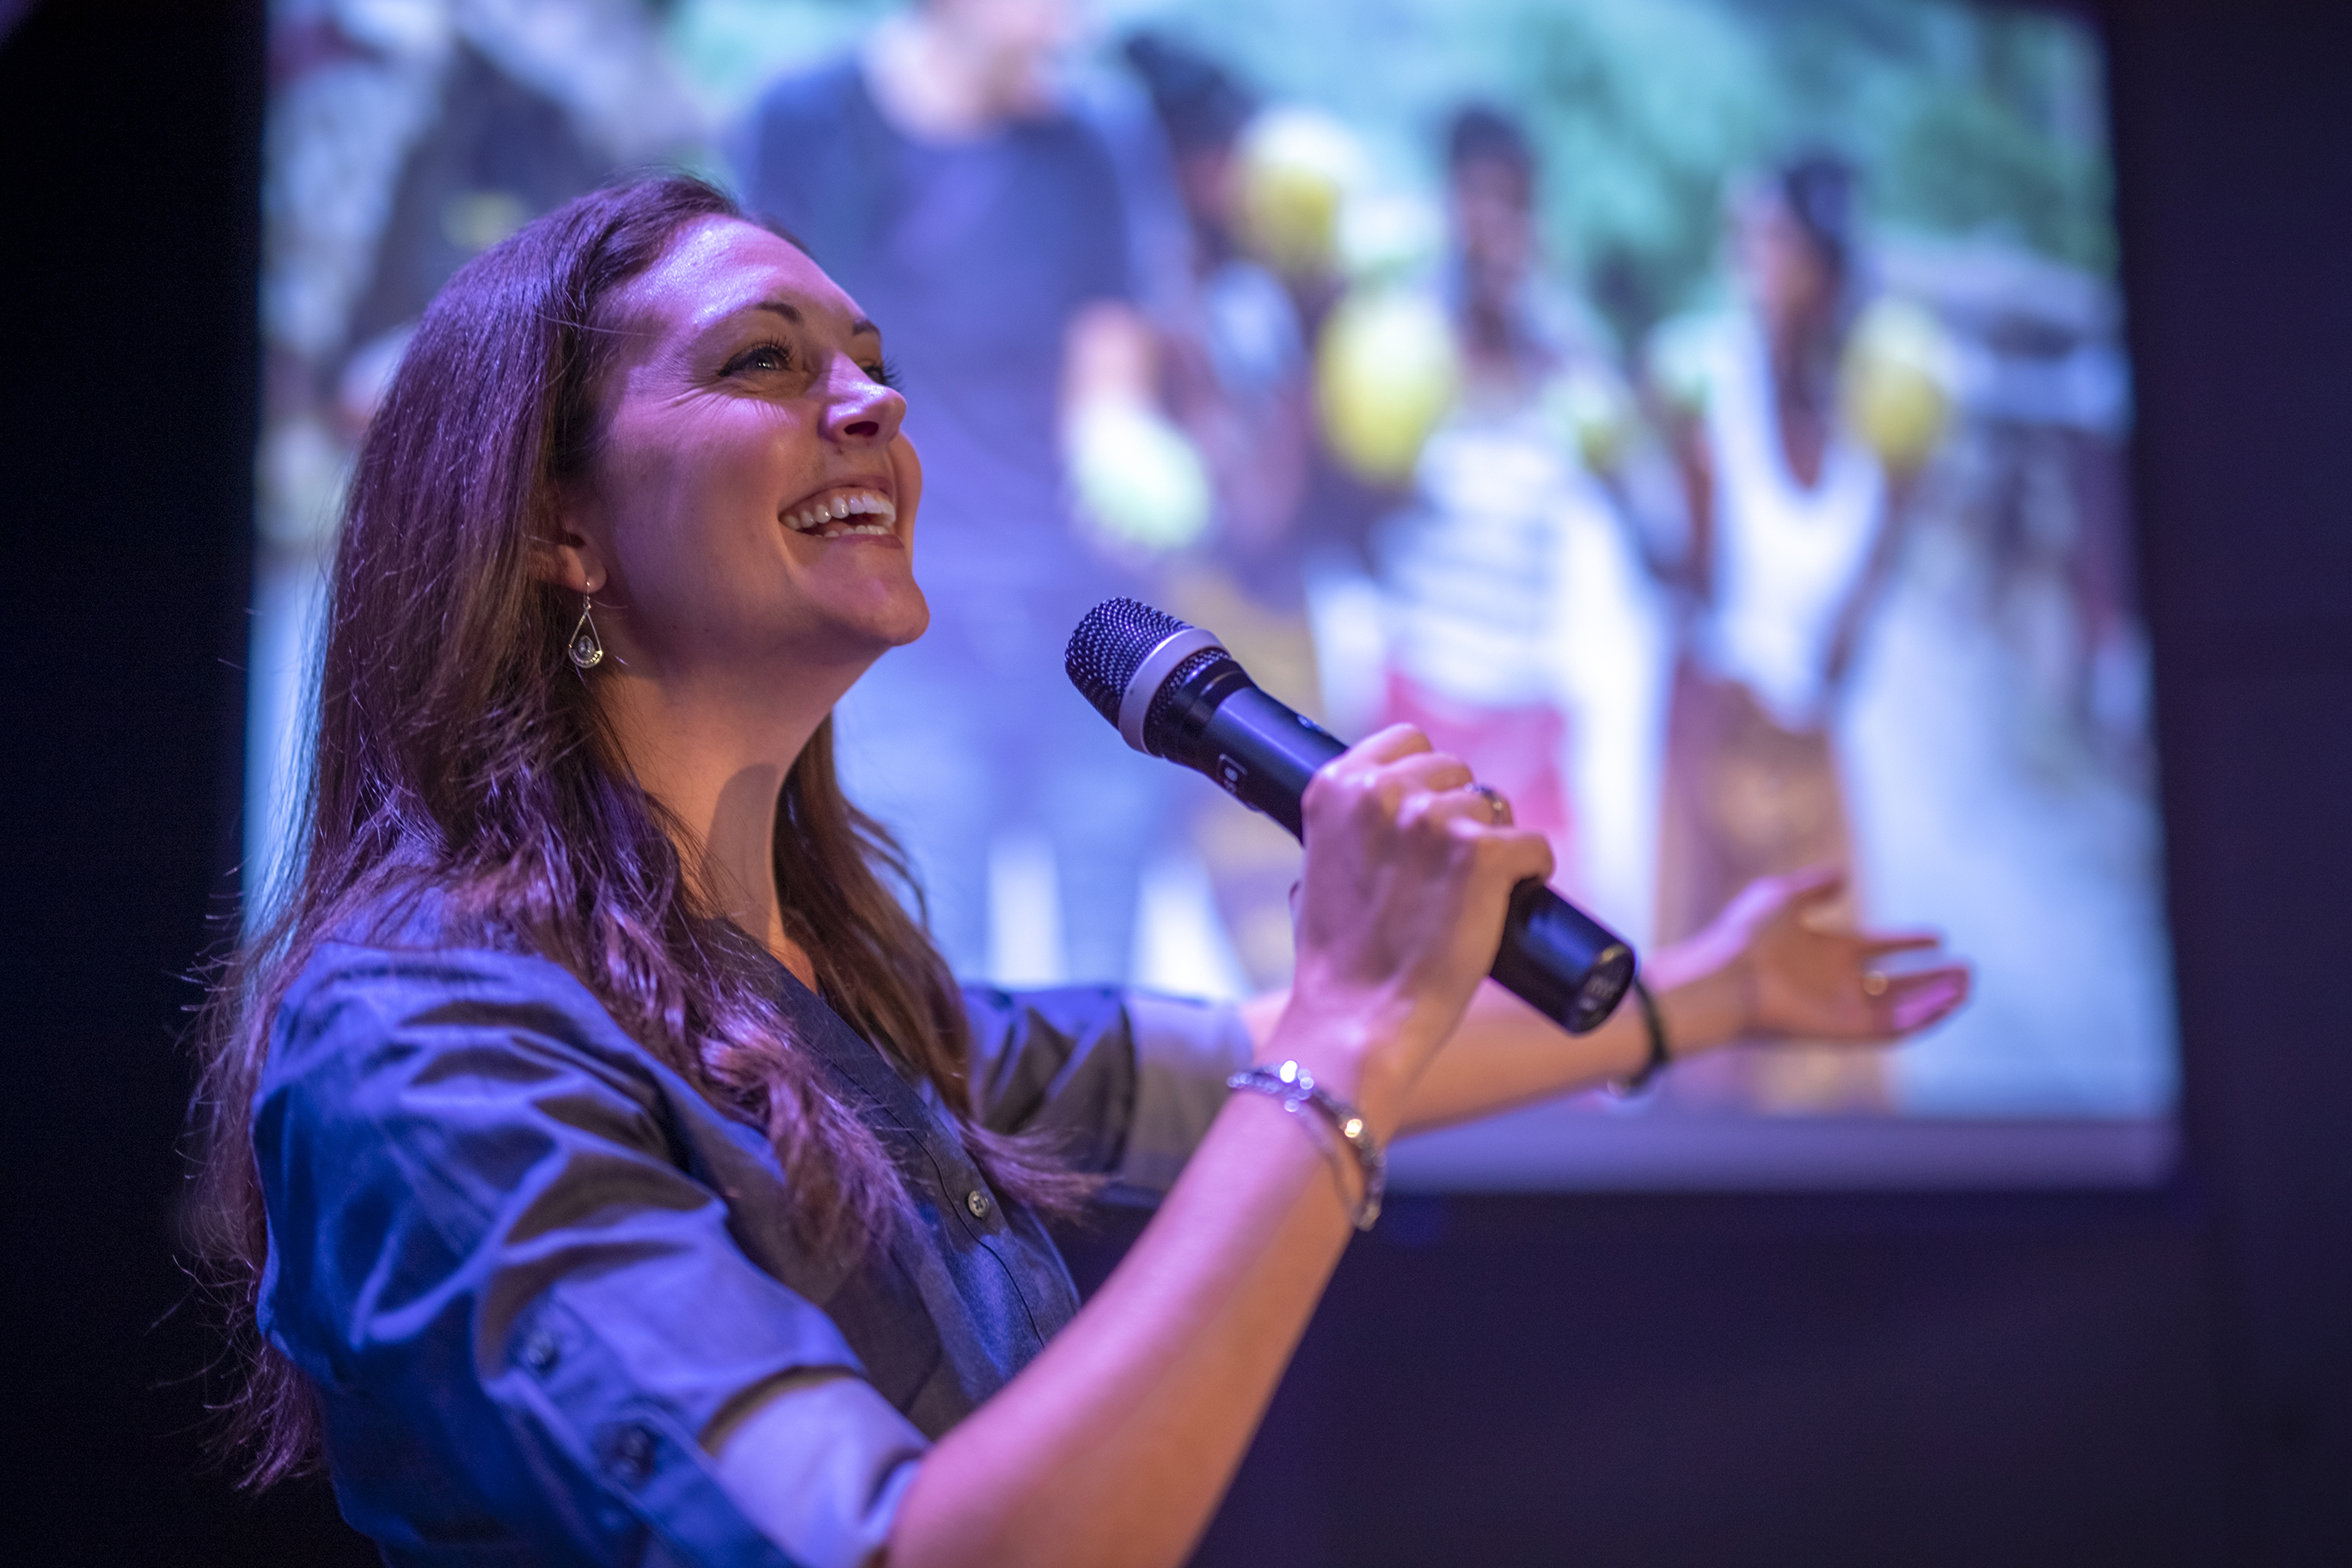 Mallory Brown, empathy keynote speaker, empowers women to lead